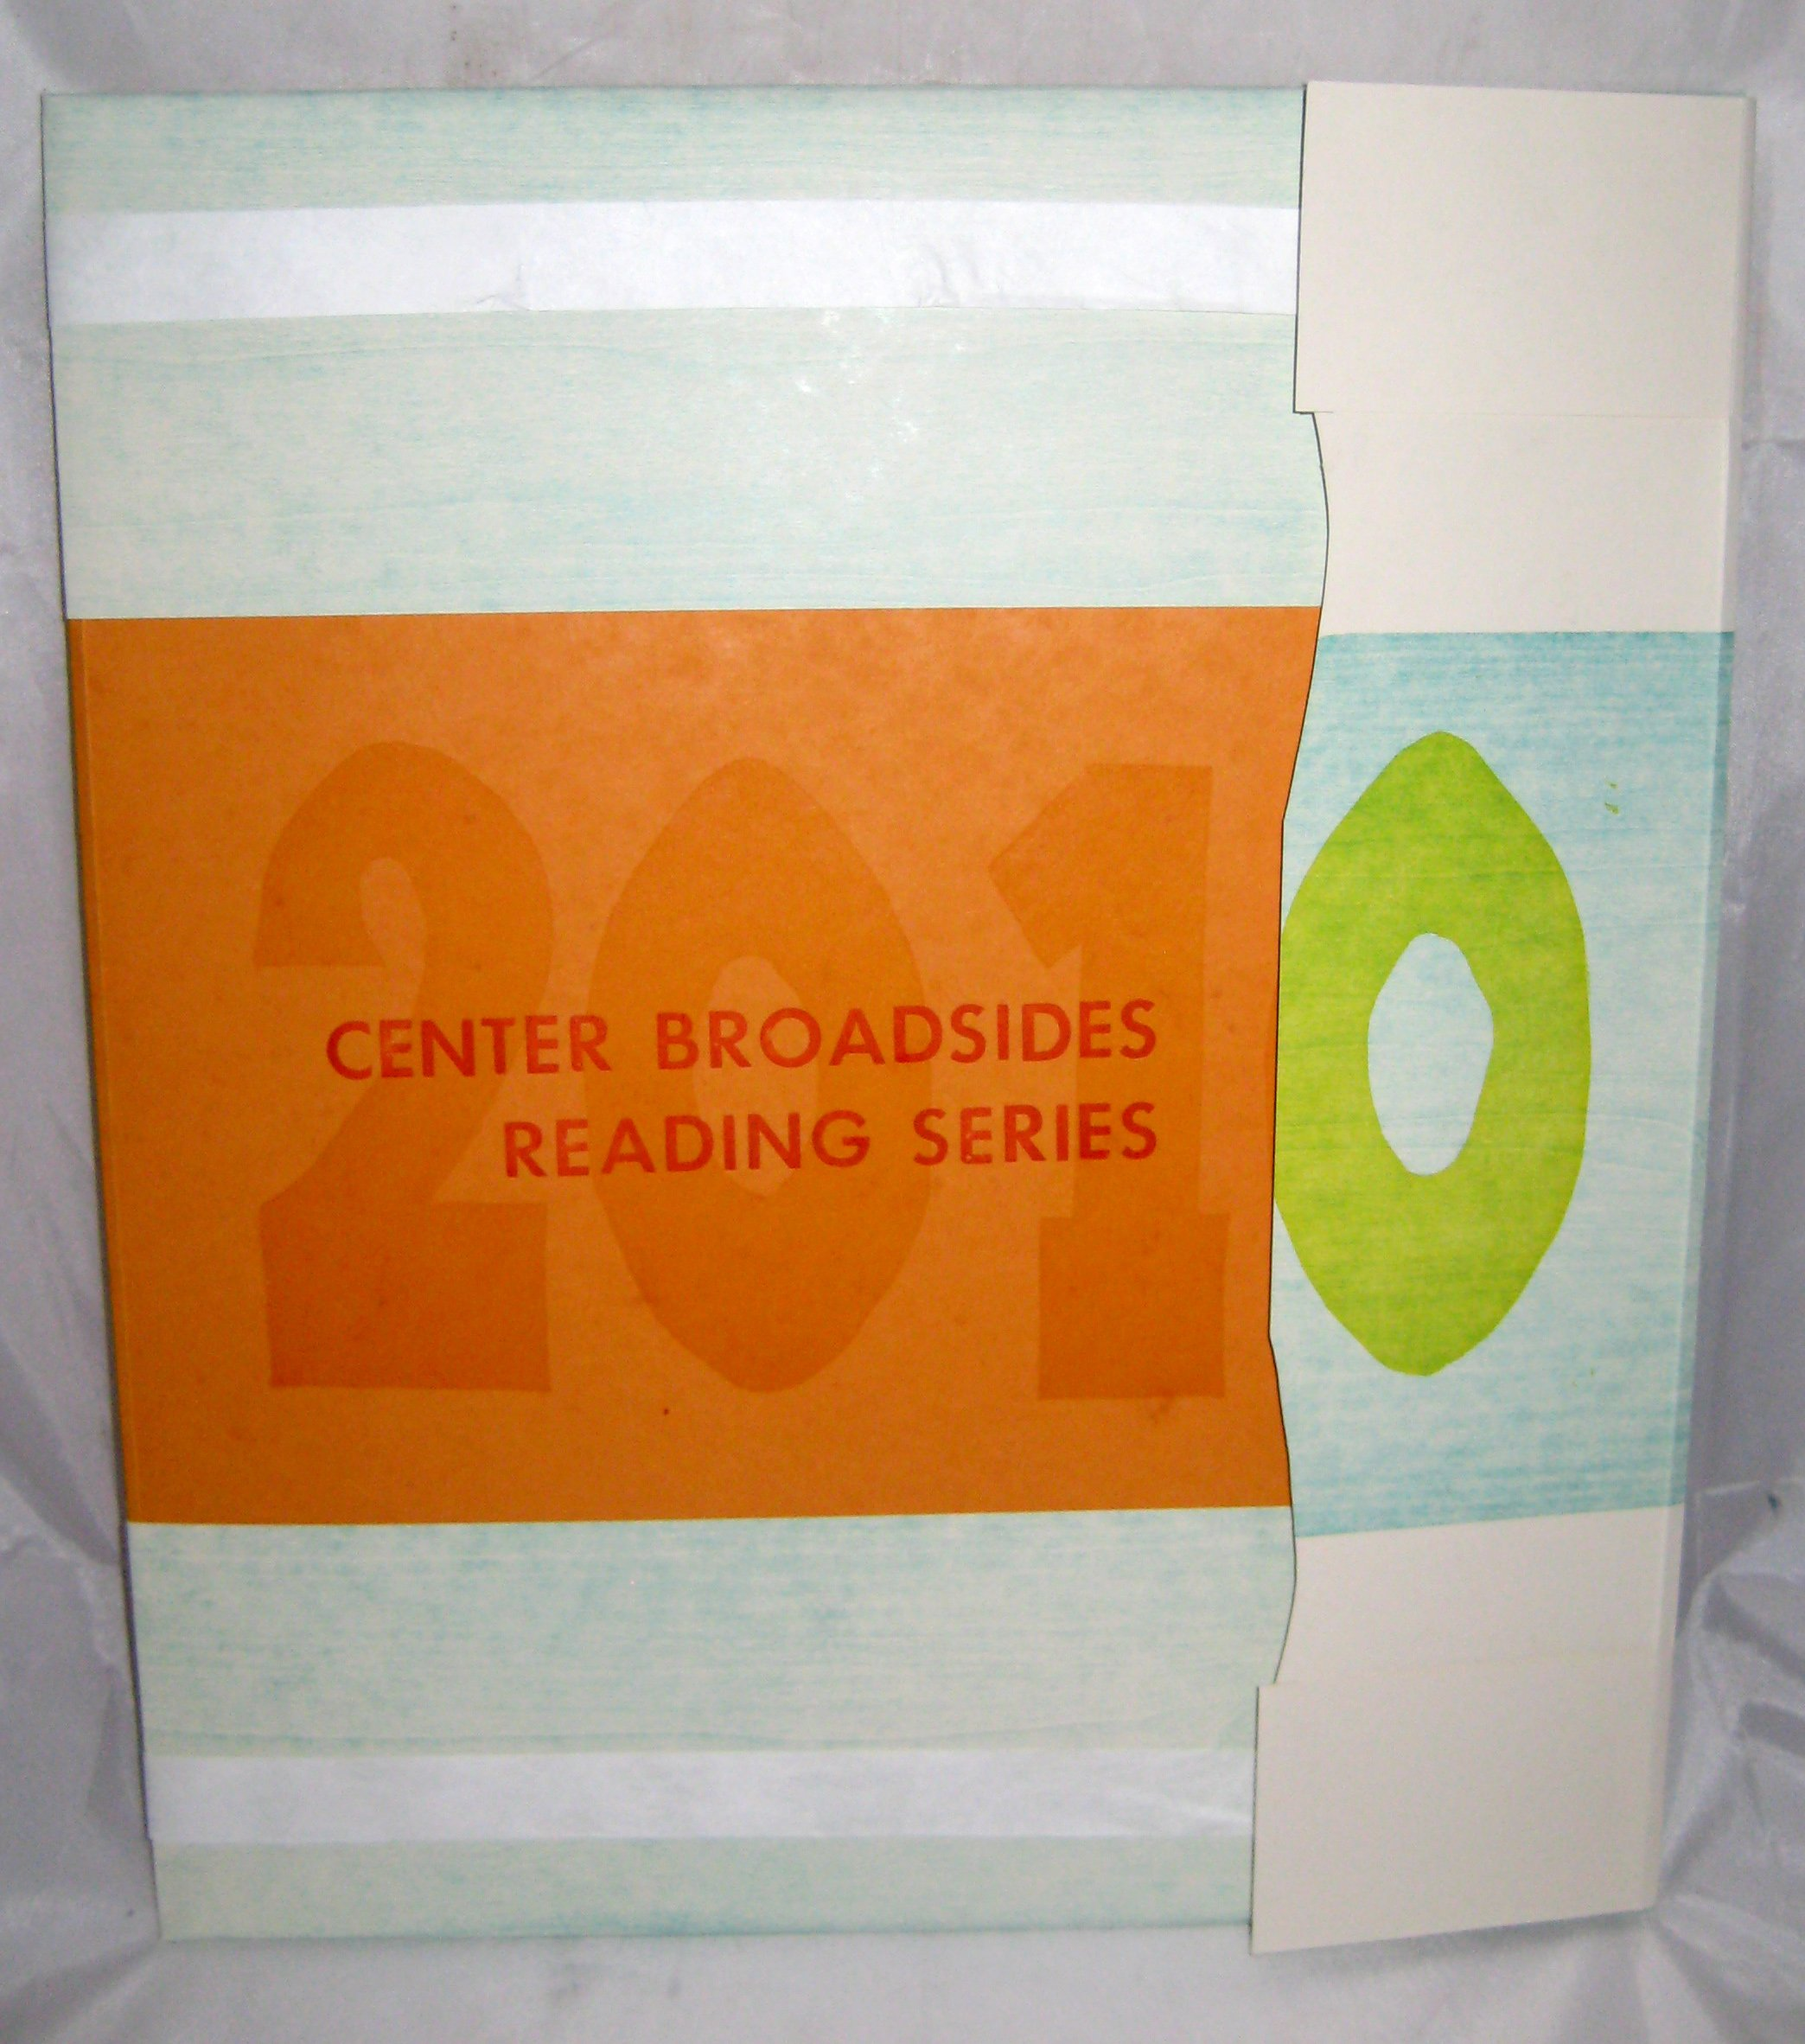 Download CENTER BROADSIDES 2010 READING SERIES pdf